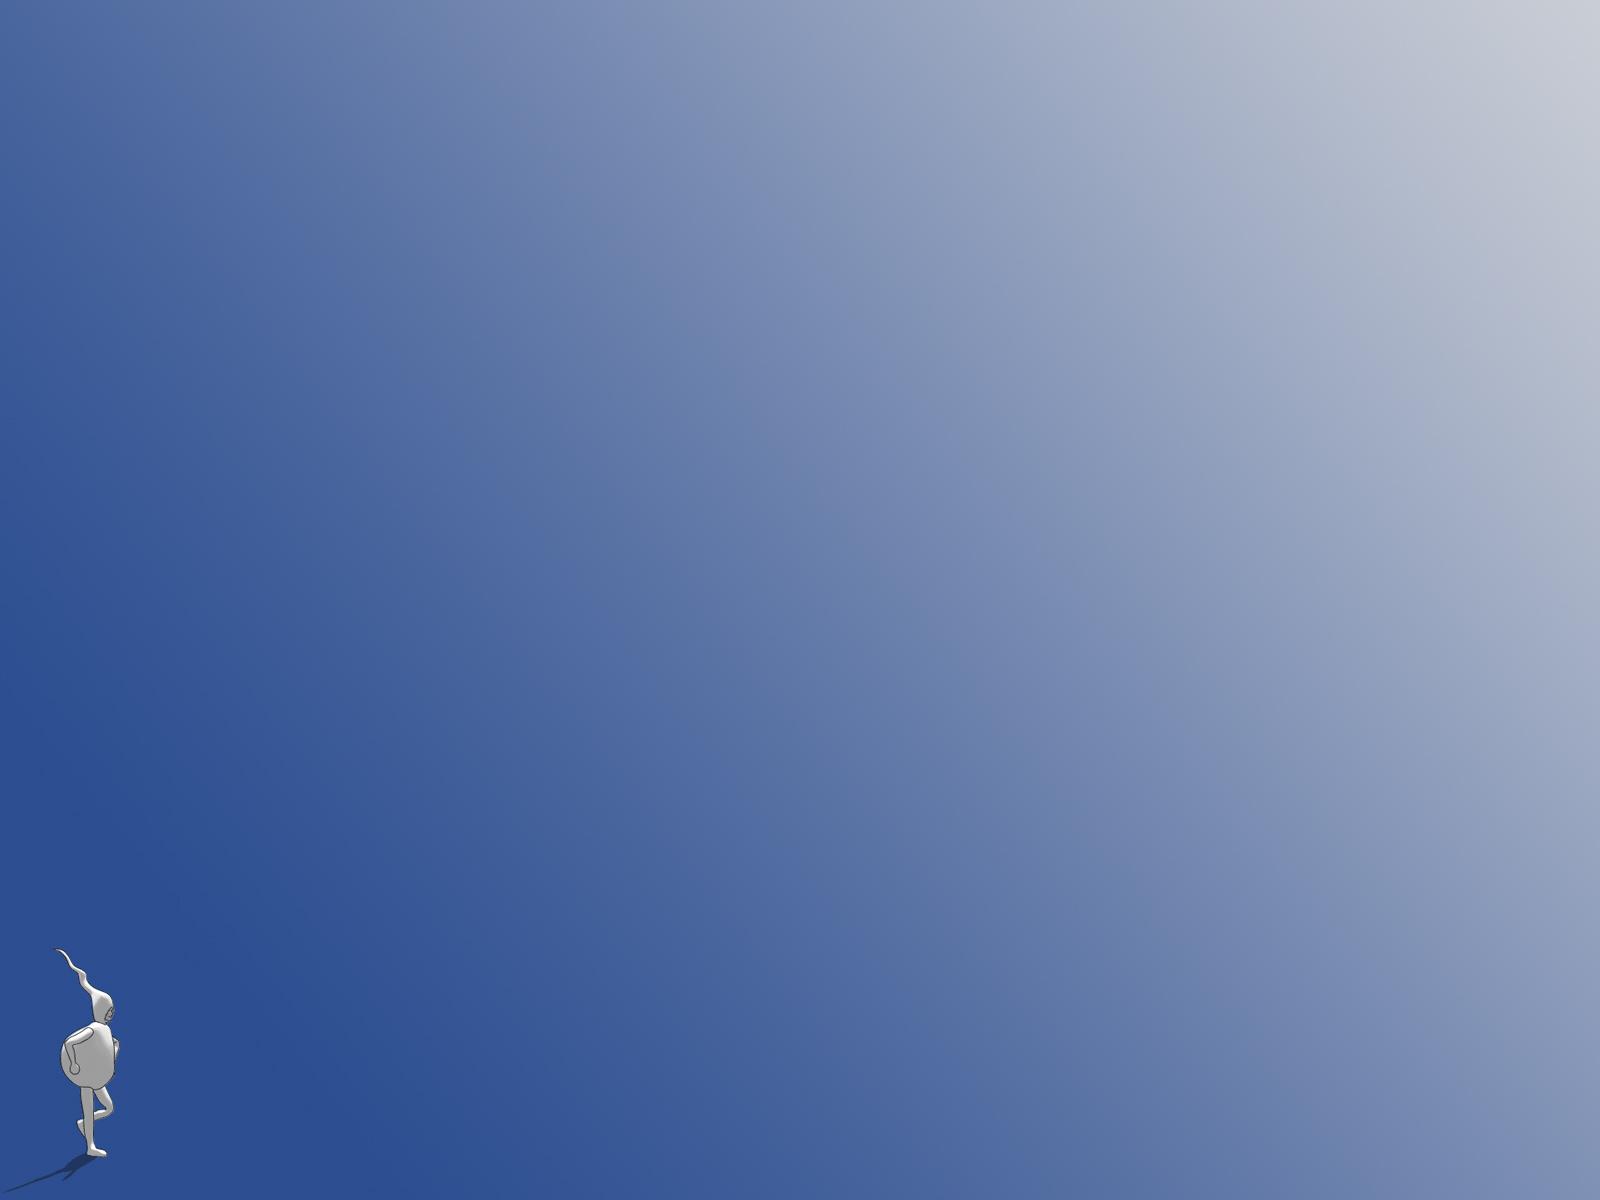 WALLPAPER] Vecctor Durex   Tips Tweaks OS customization   Neowin 1600x1200